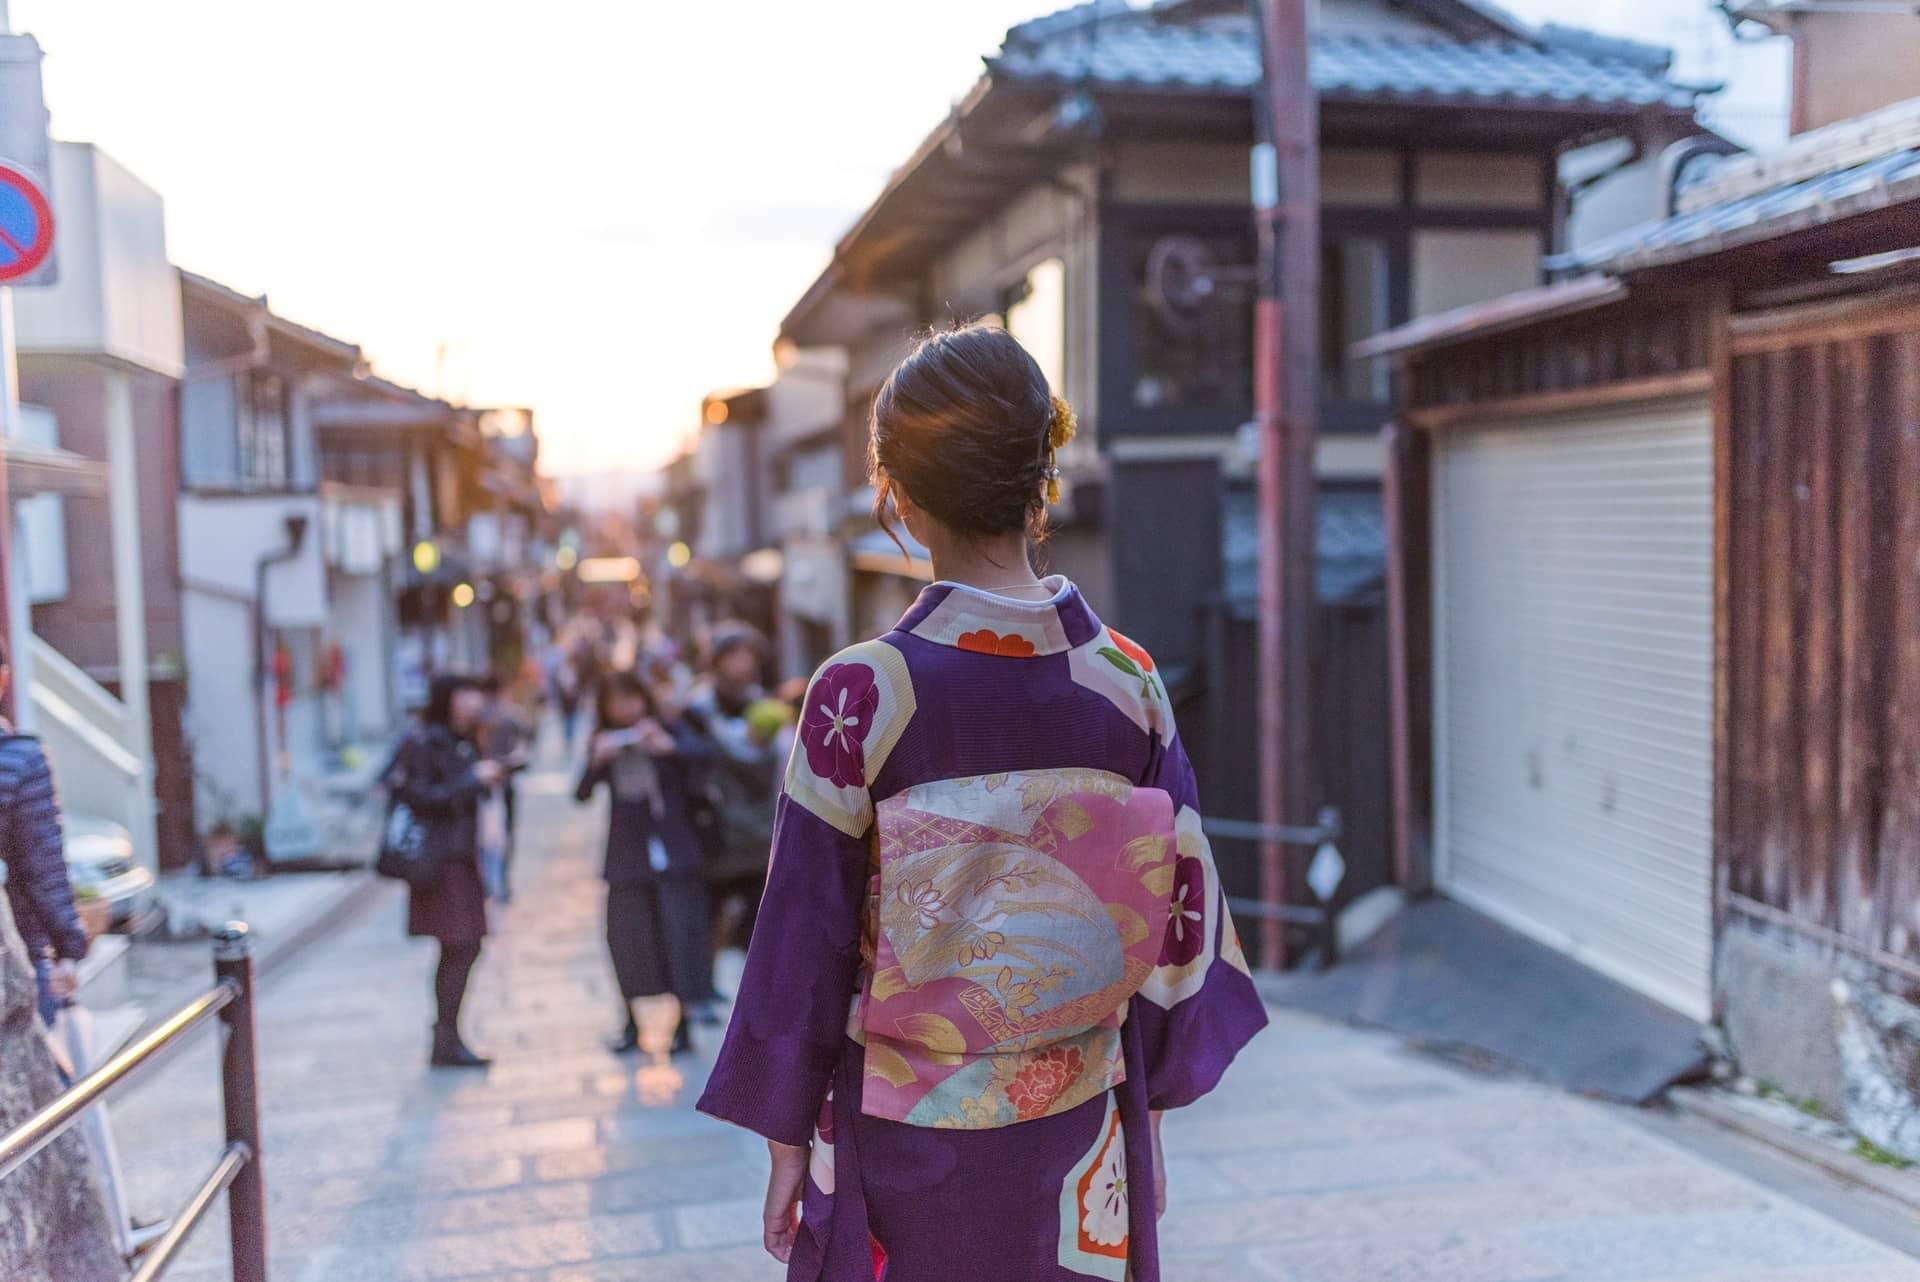 Calle de Ninenzaka en Higashiyama, Kioto, ciudades de Japón